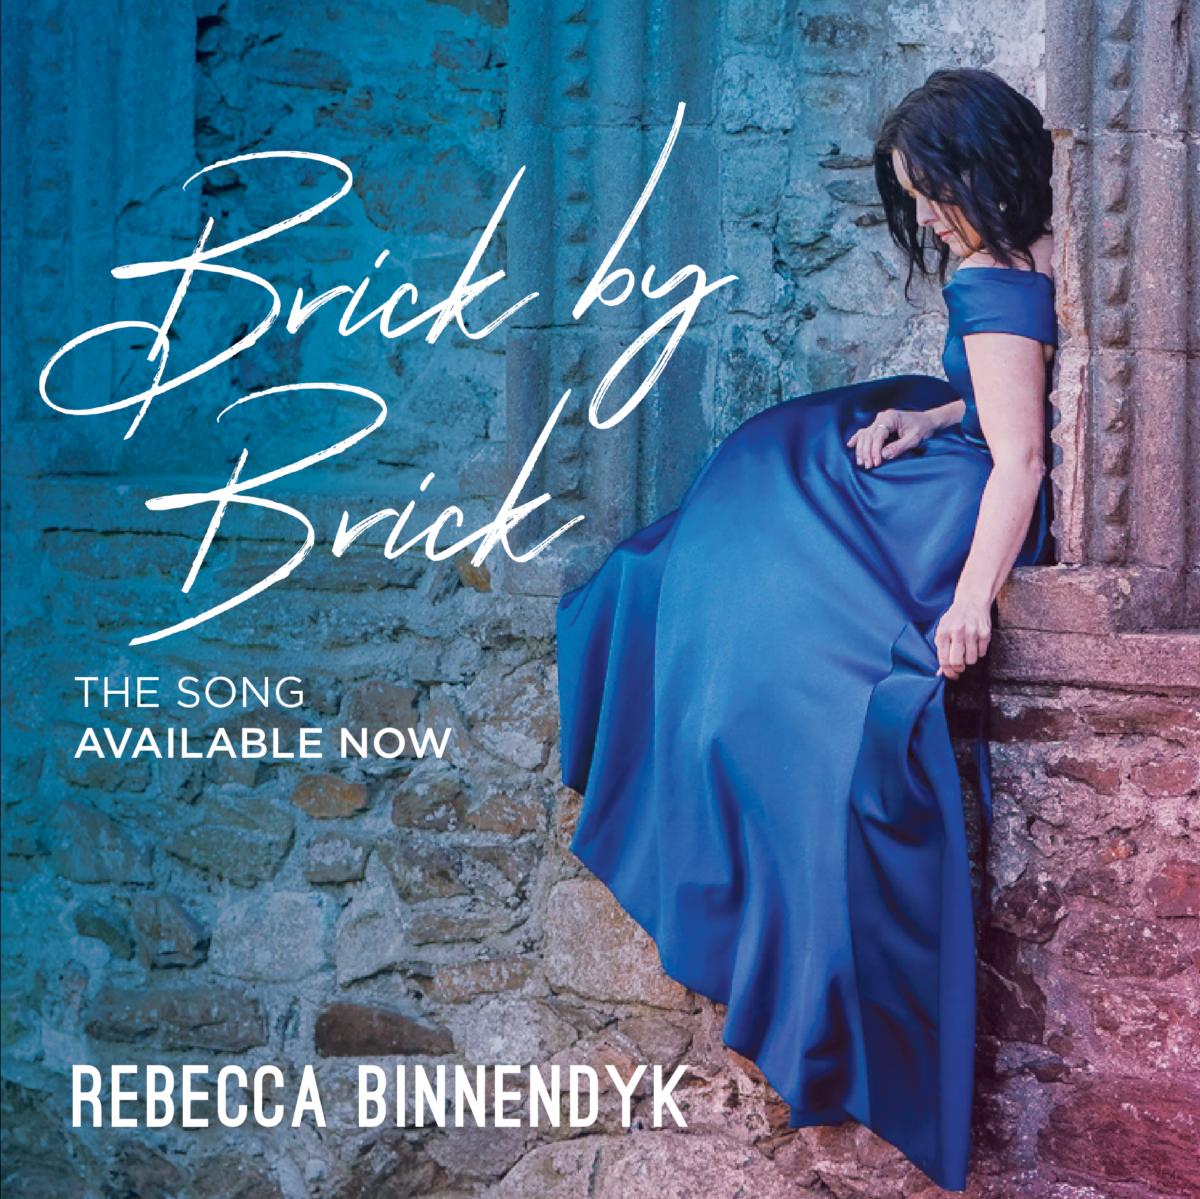 Rebecca Binnendyk returning to the spotlight